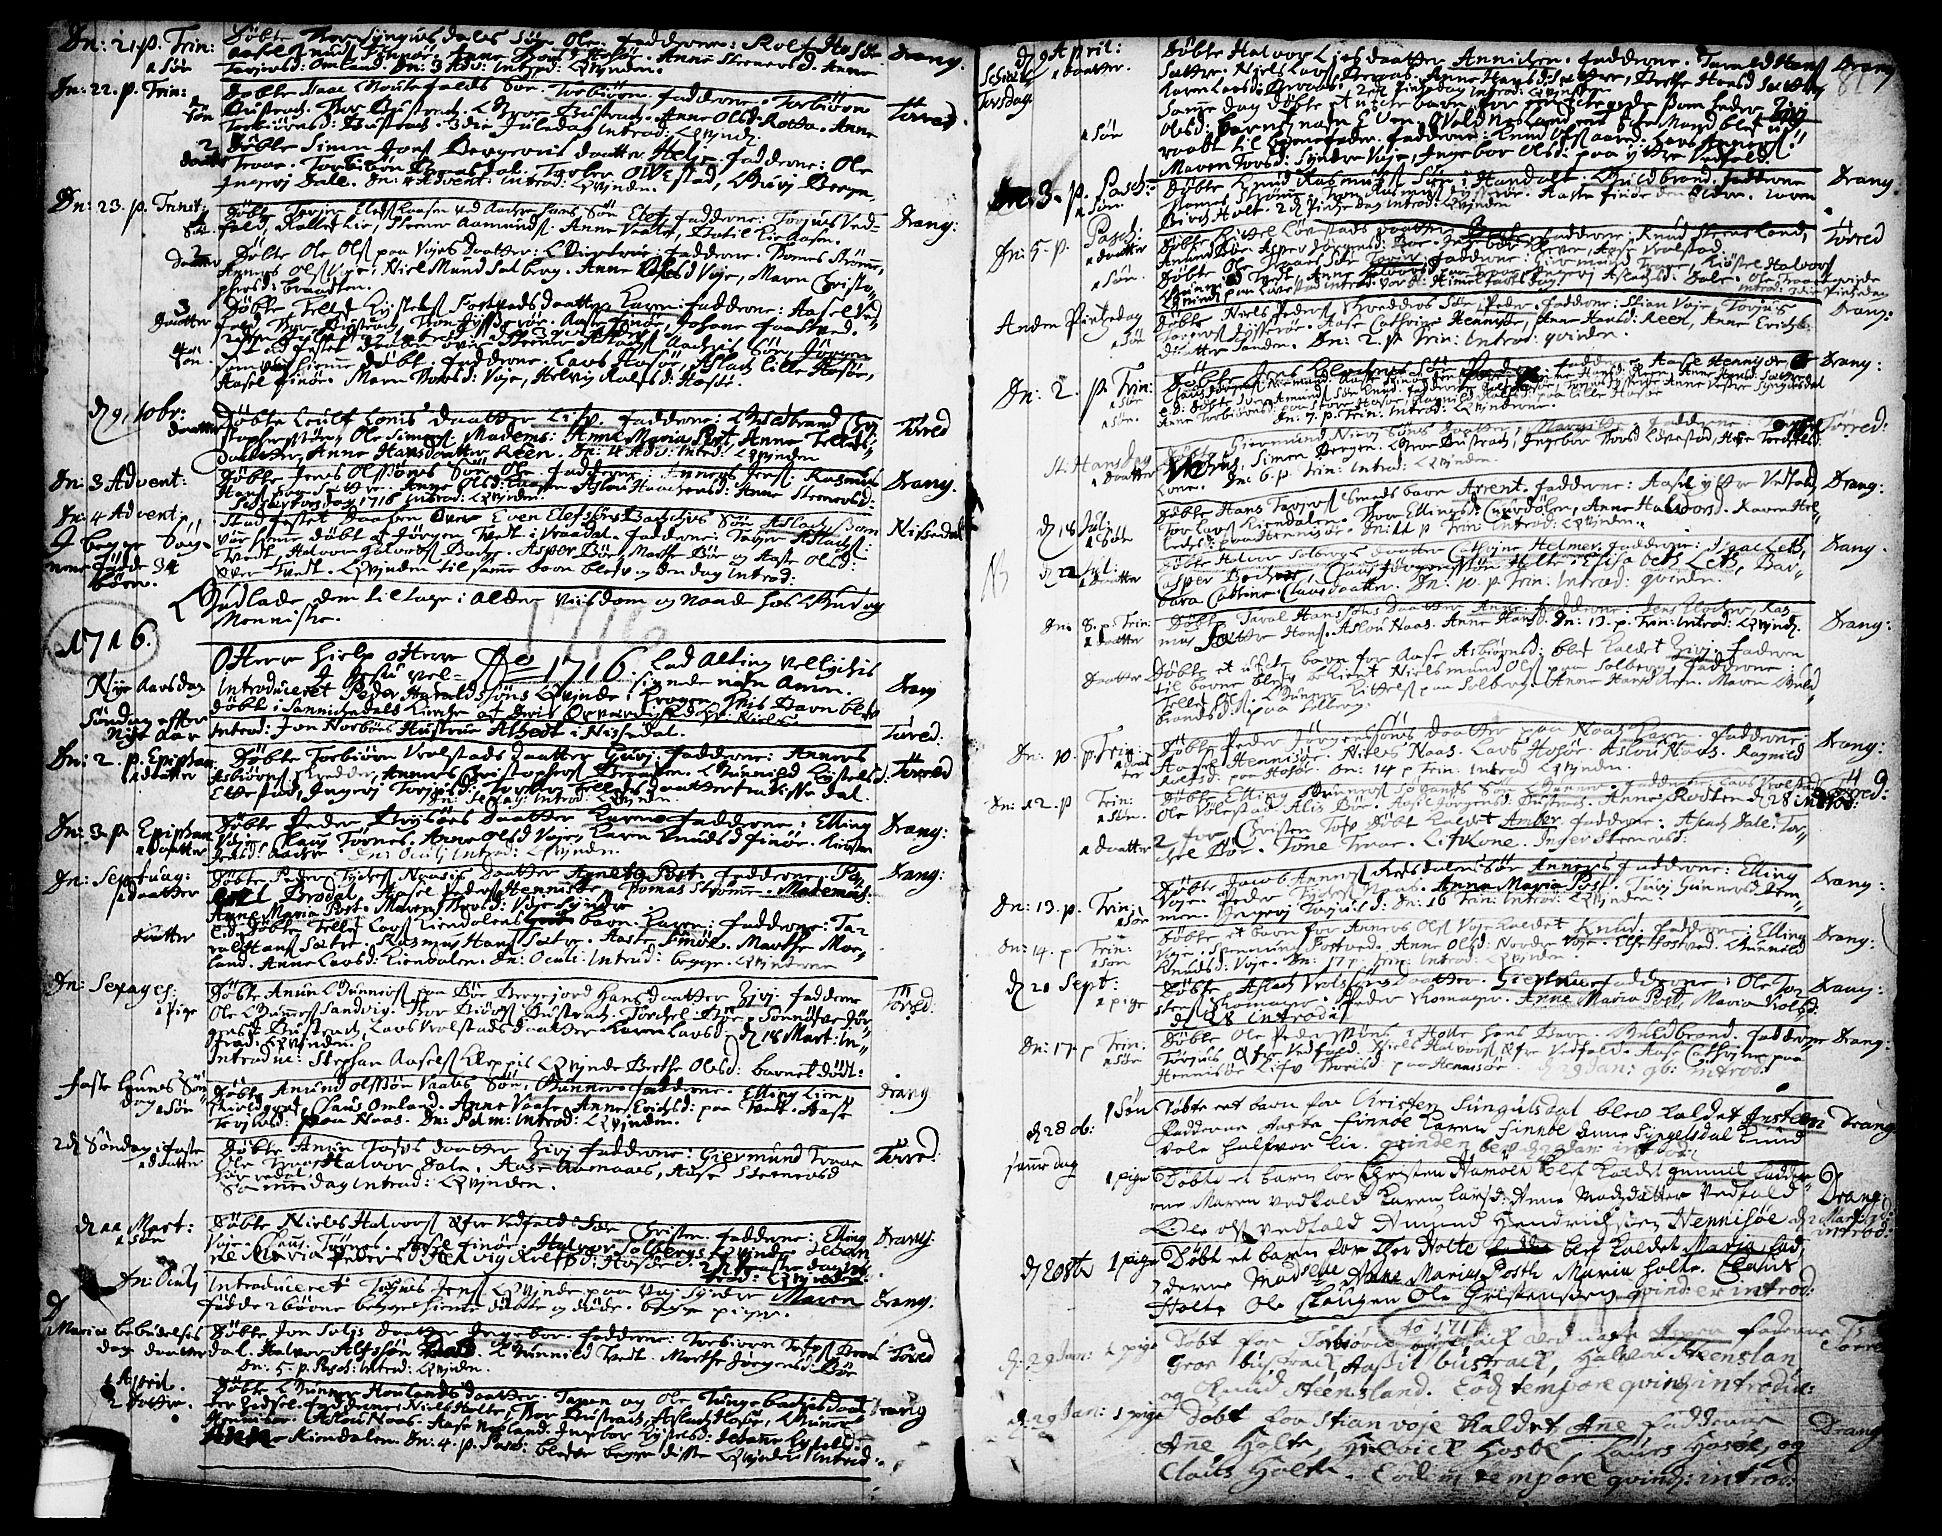 SAKO, Drangedal kirkebøker, F/Fa/L0001: Ministerialbok nr. 1, 1697-1767, s. 81